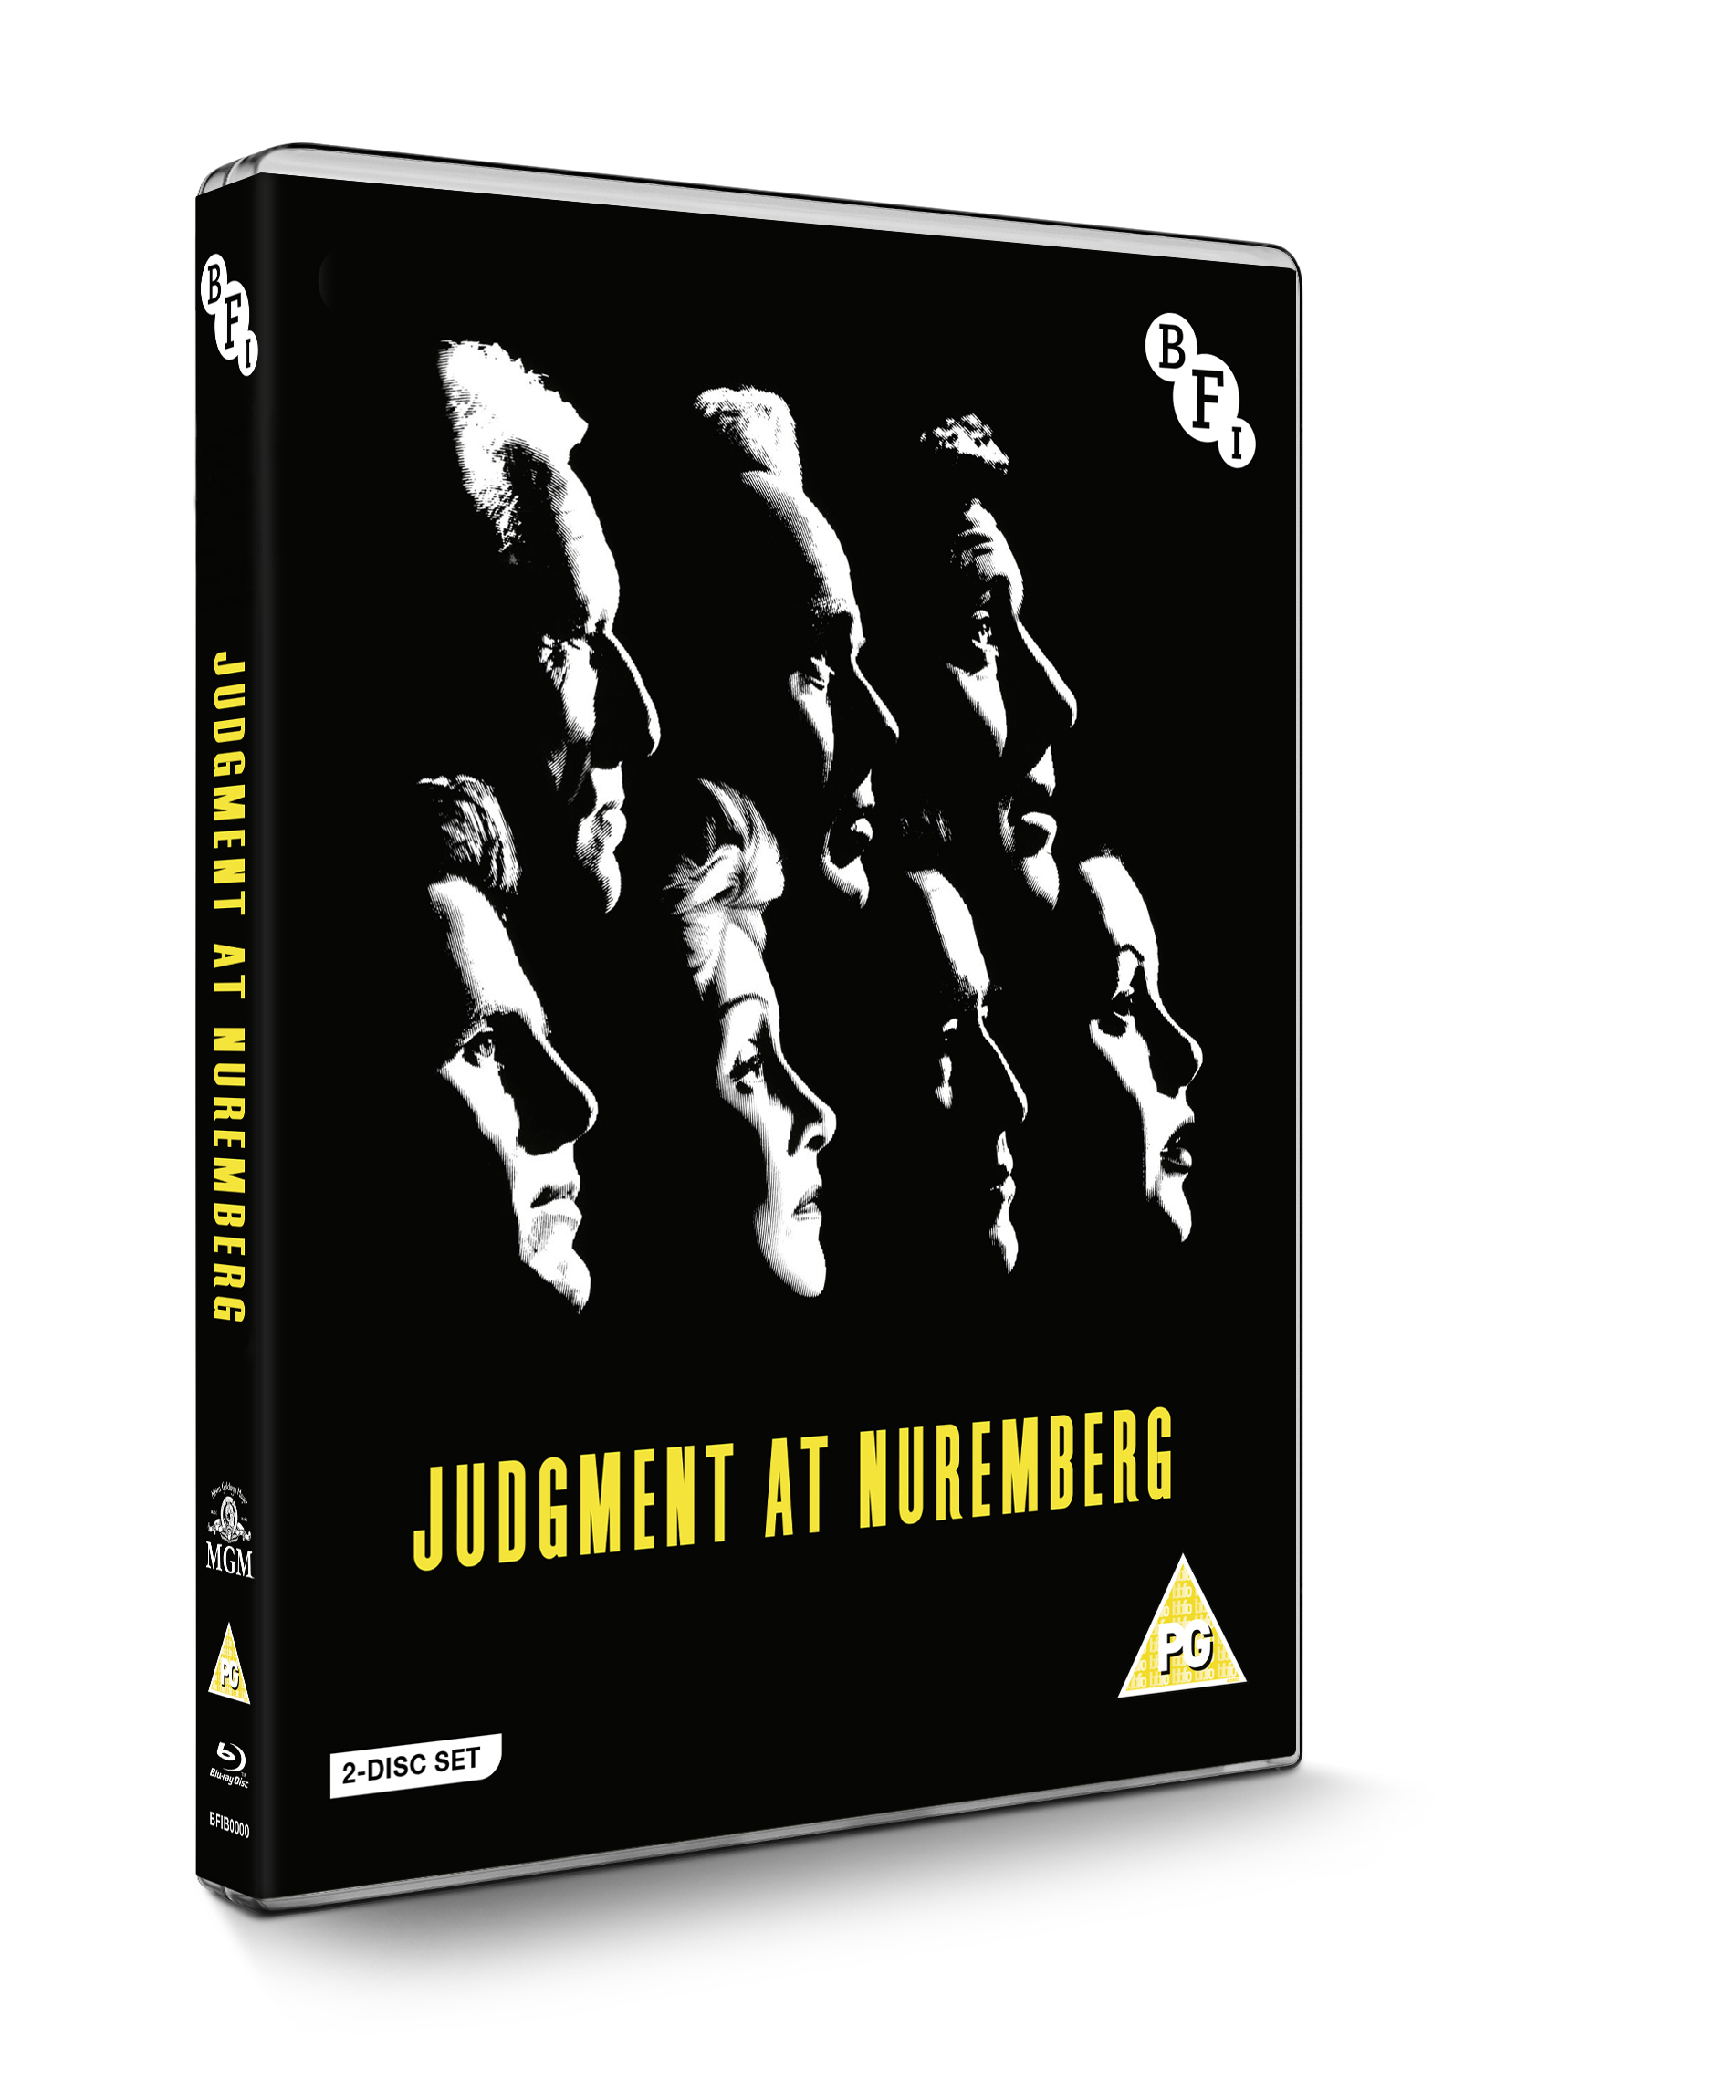 Buy Judgment at Nuremberg (Blu-ray)